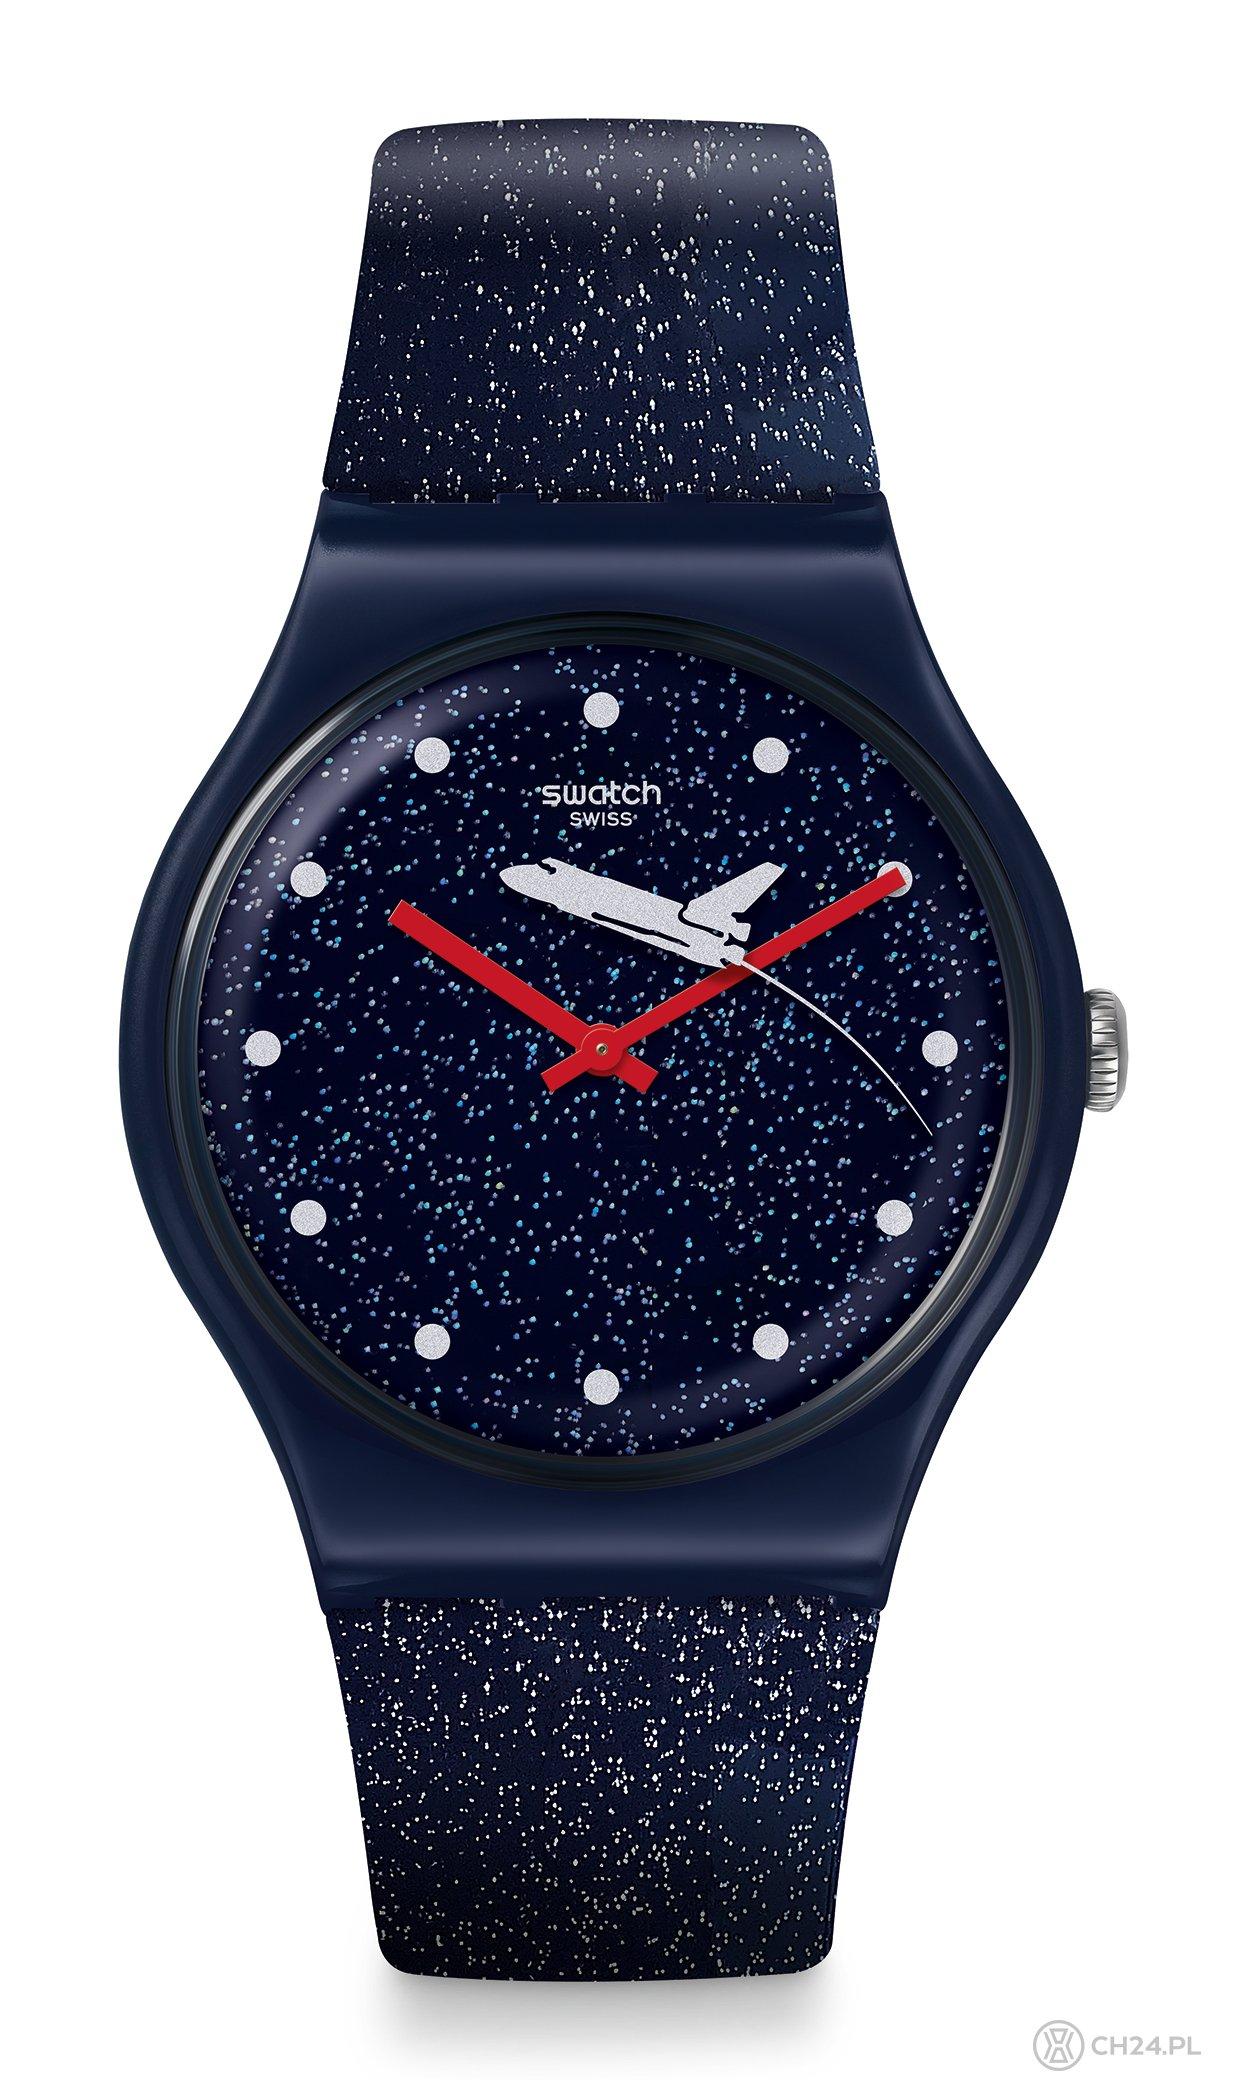 "Swatch X 007 ""Moonraker"""